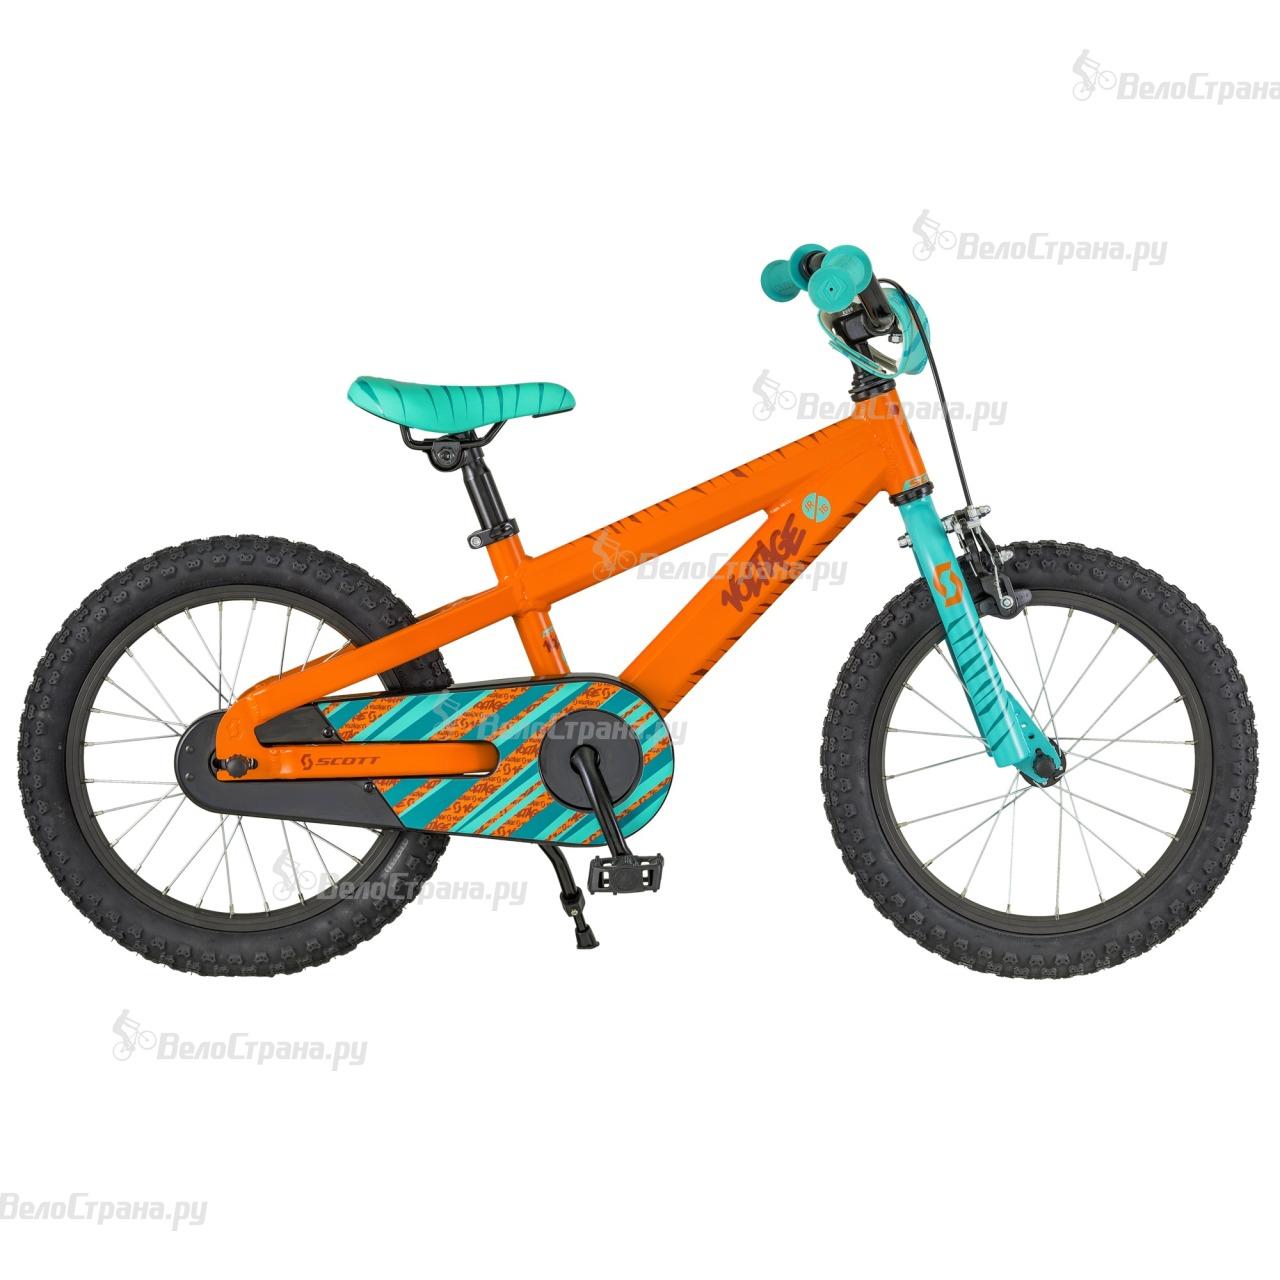 Велосипед Scott Voltage JR 16 Bike (2018)